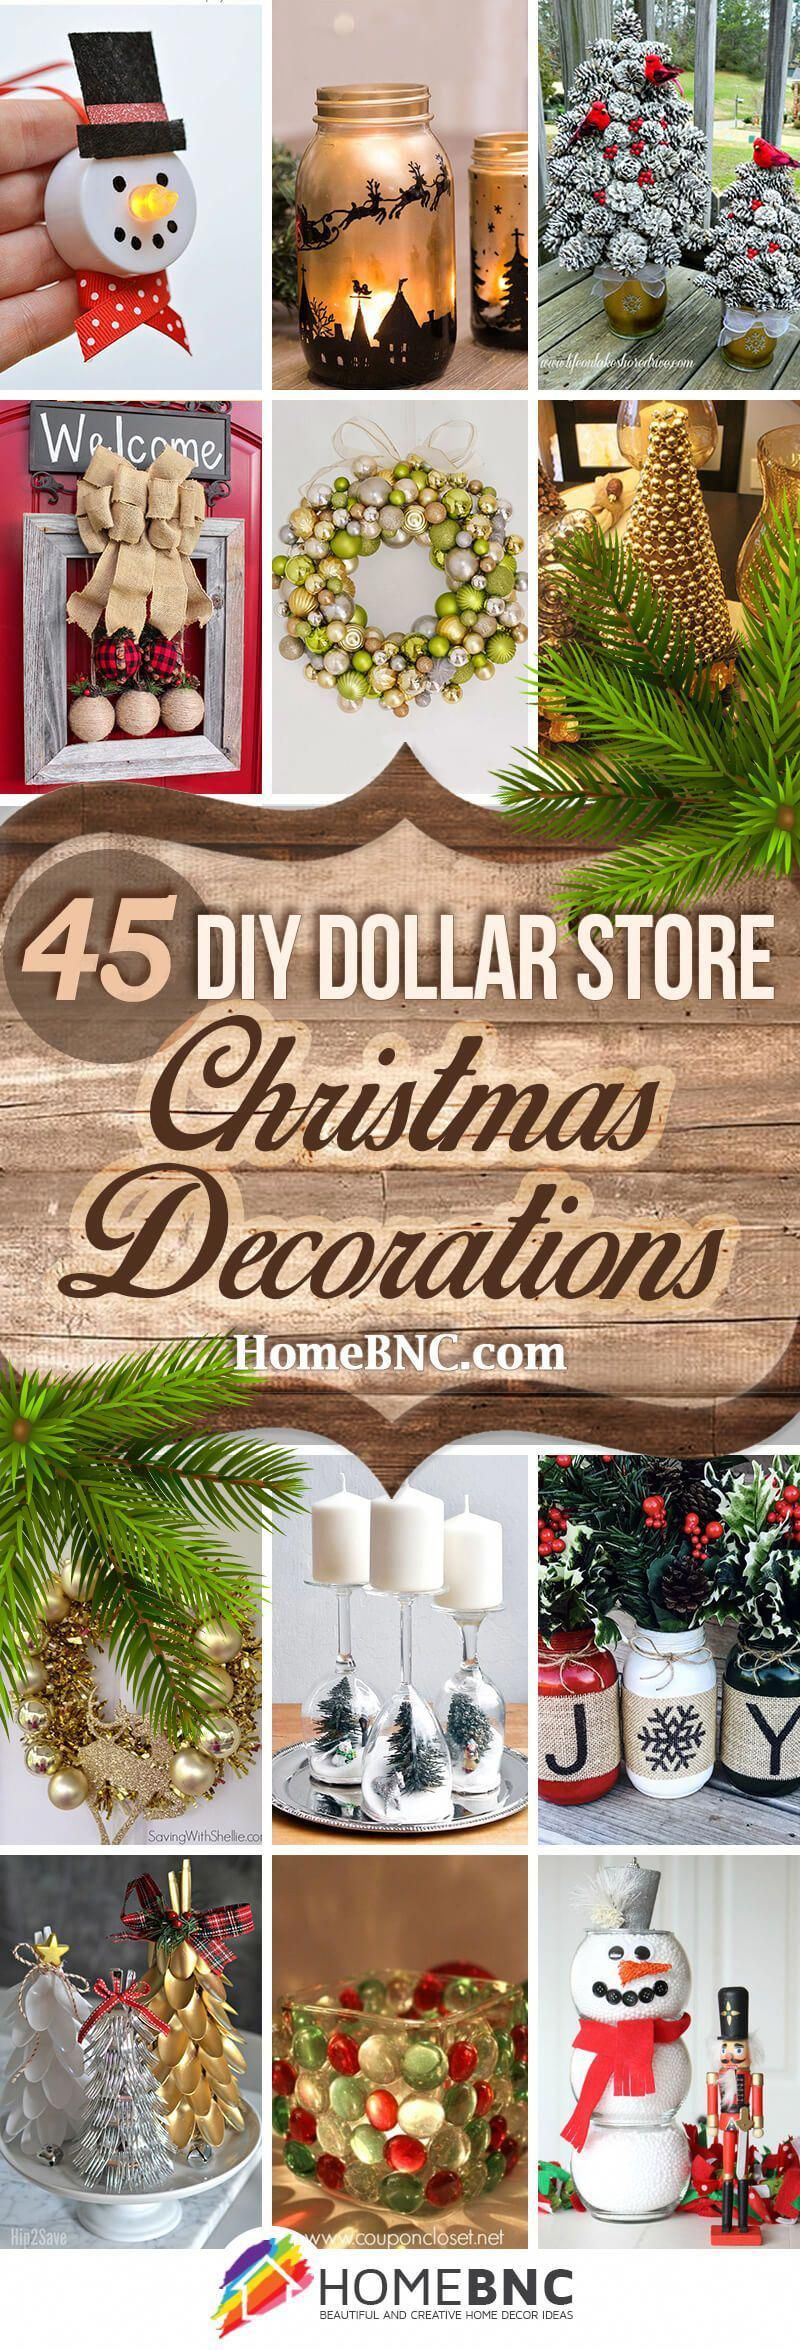 45 Best DIY Dollar Store Christmas Decor Craft Ideas for